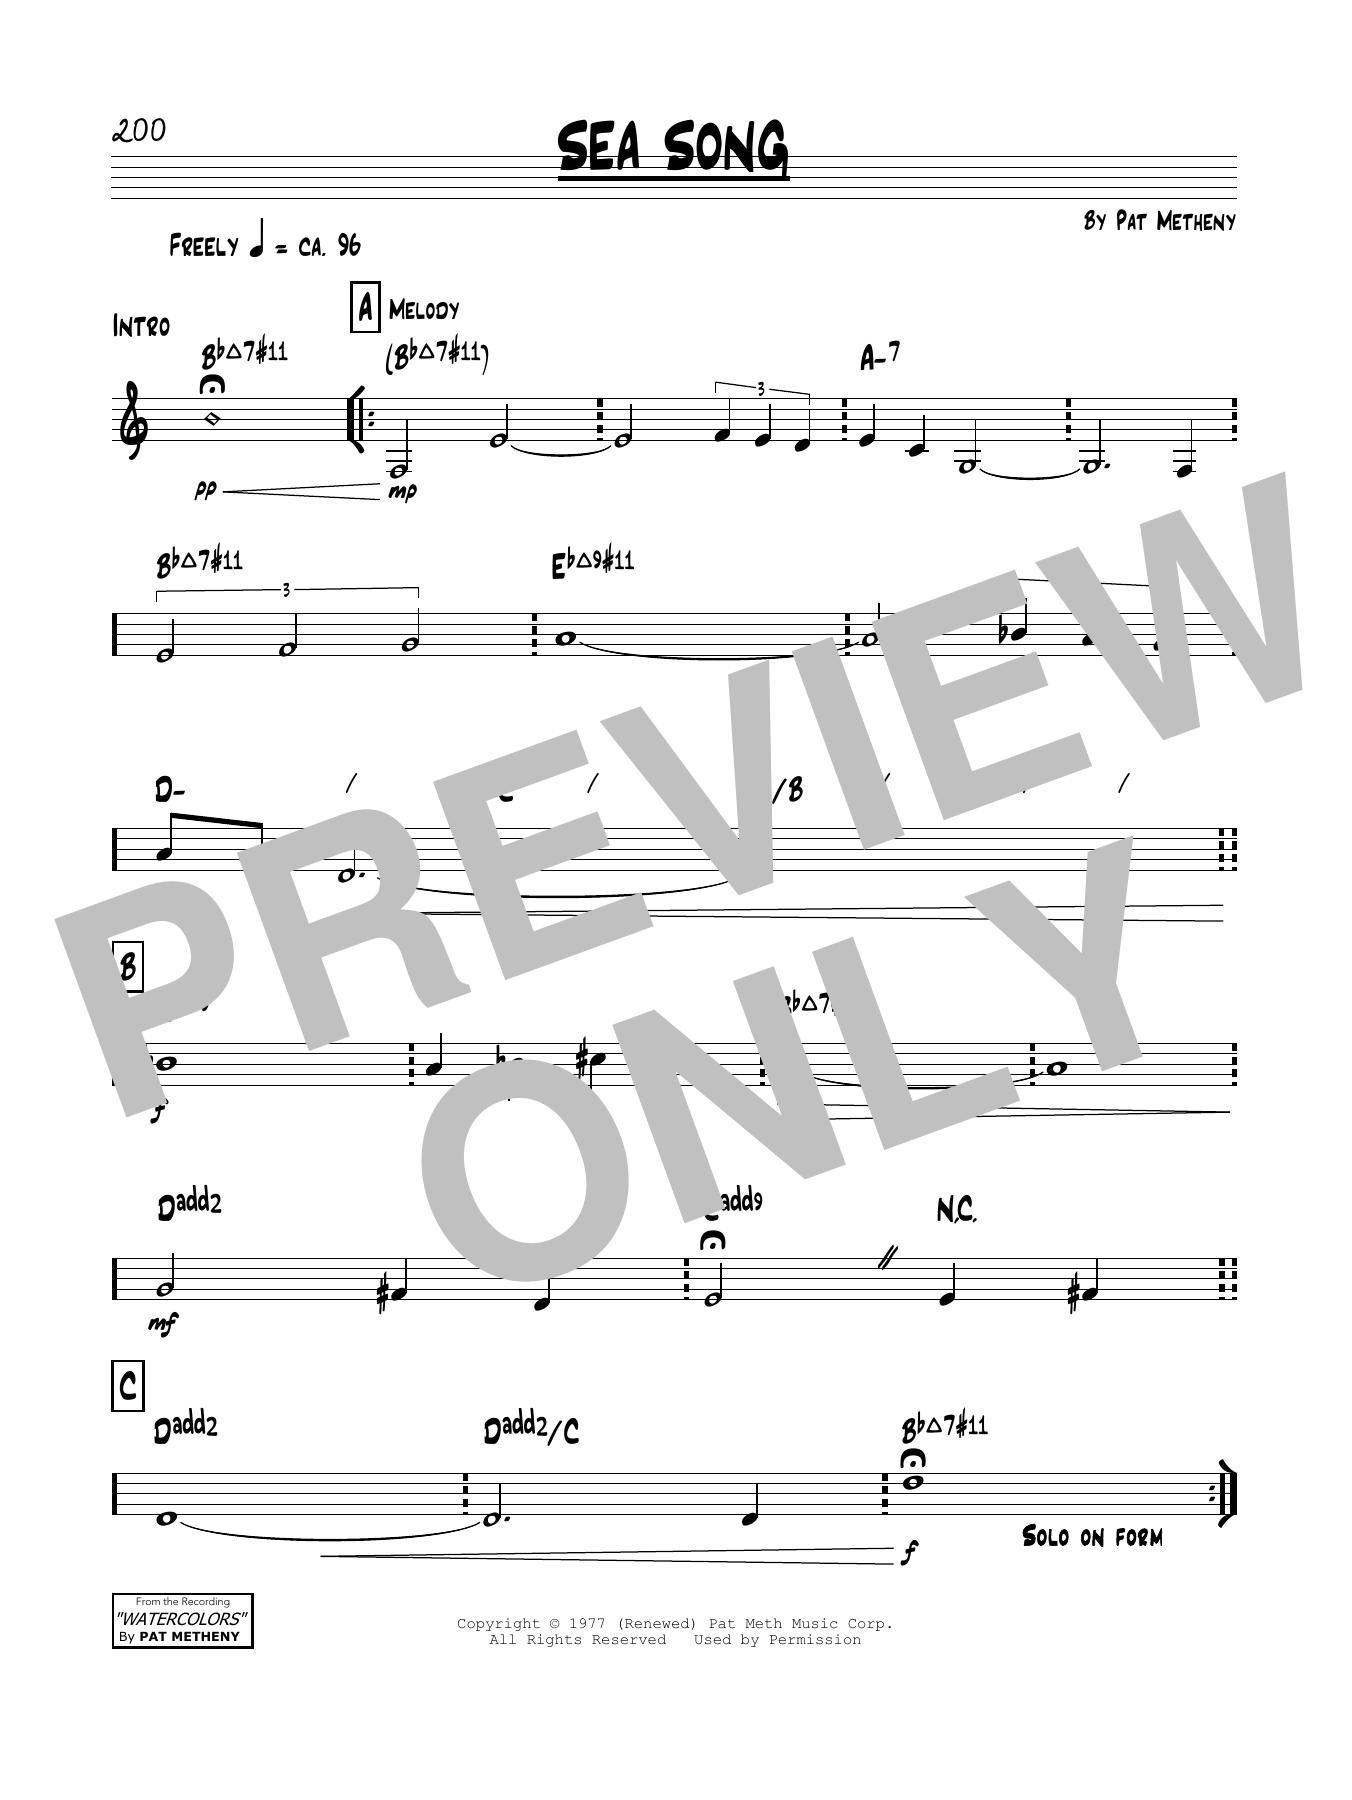 Pat Metheny Sea Song sheet music notes and chords. Download Printable PDF.